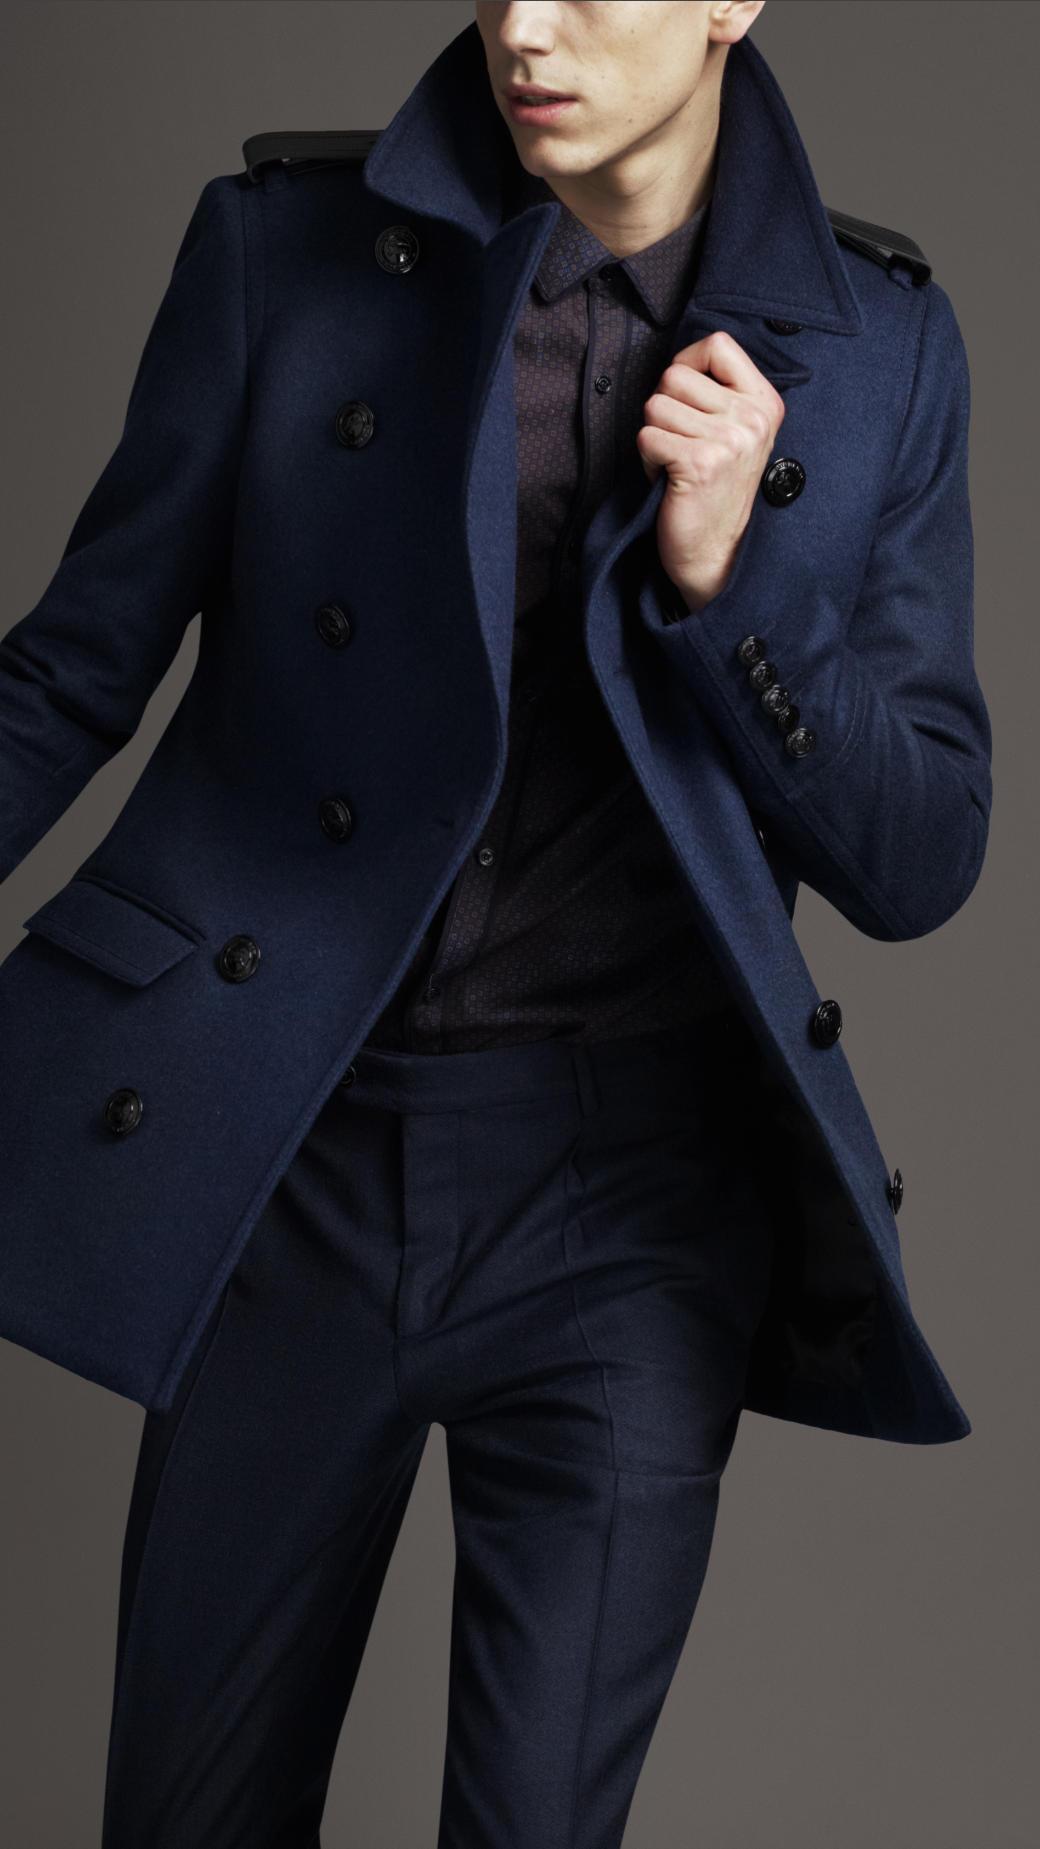 mens military style winter coats photo - 1